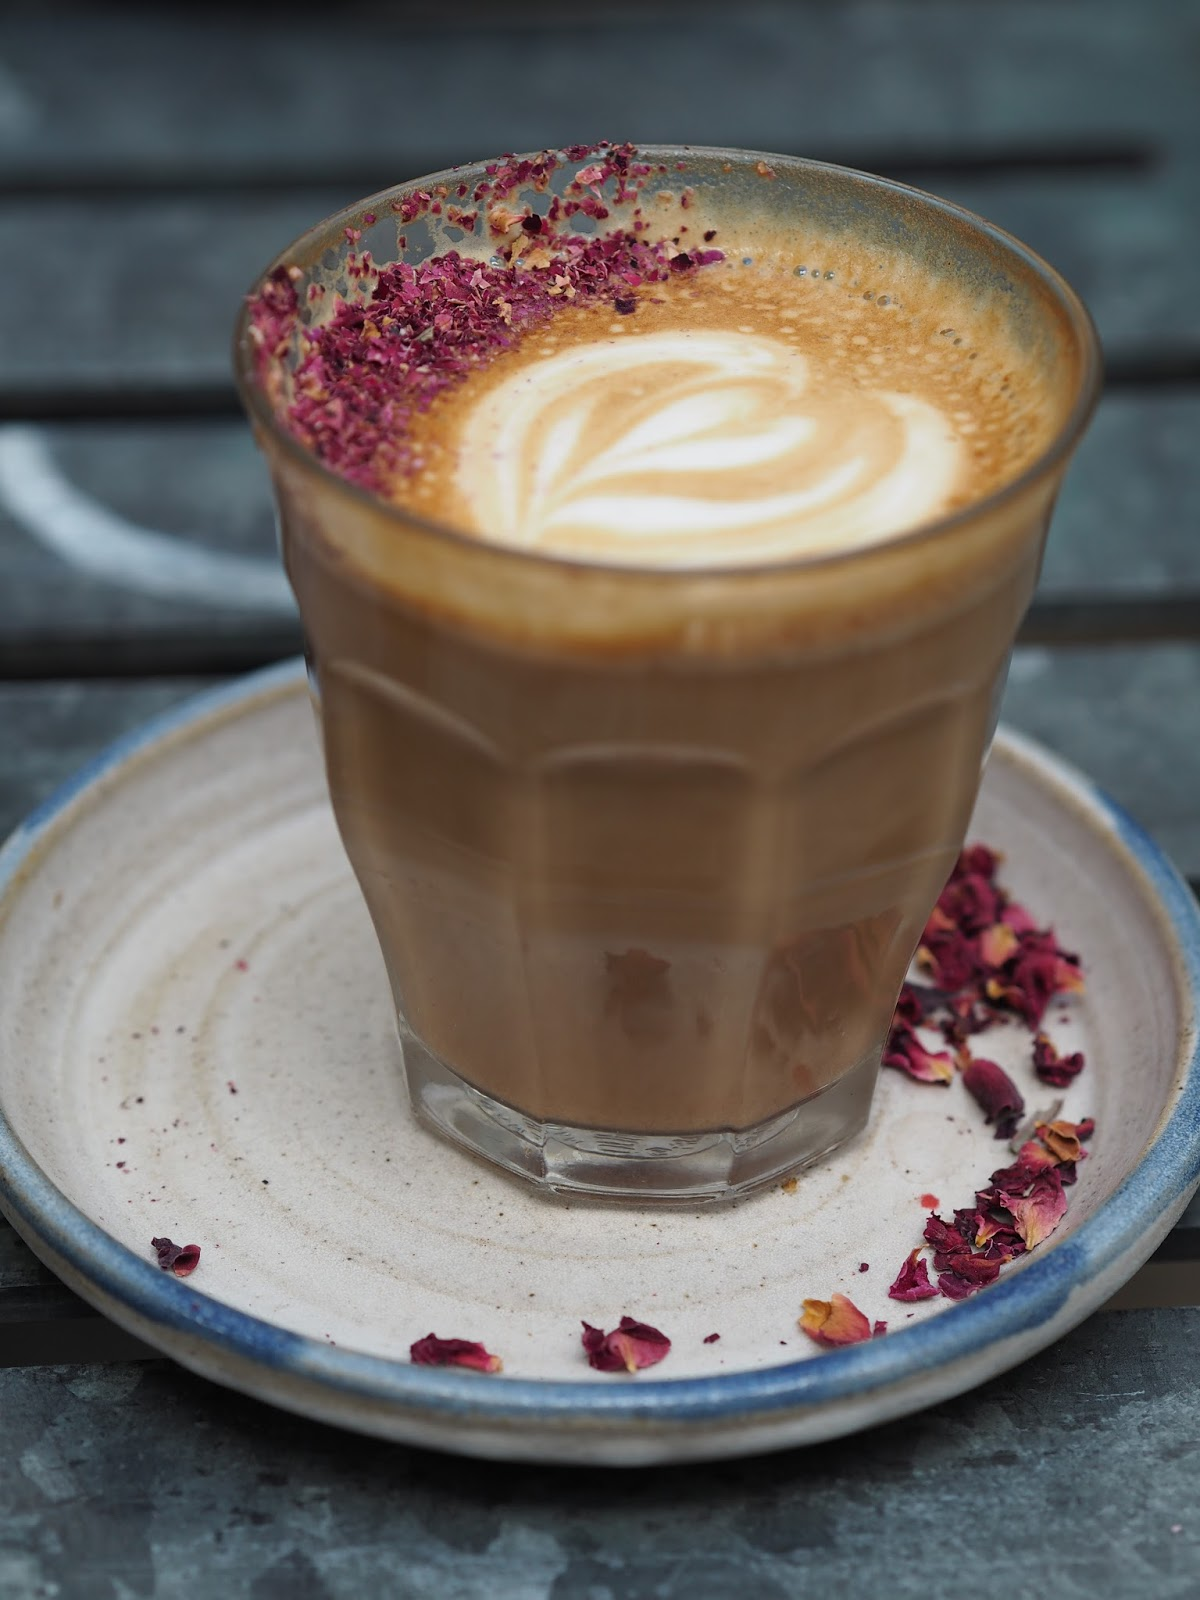 farm girl cafe rose petal latte